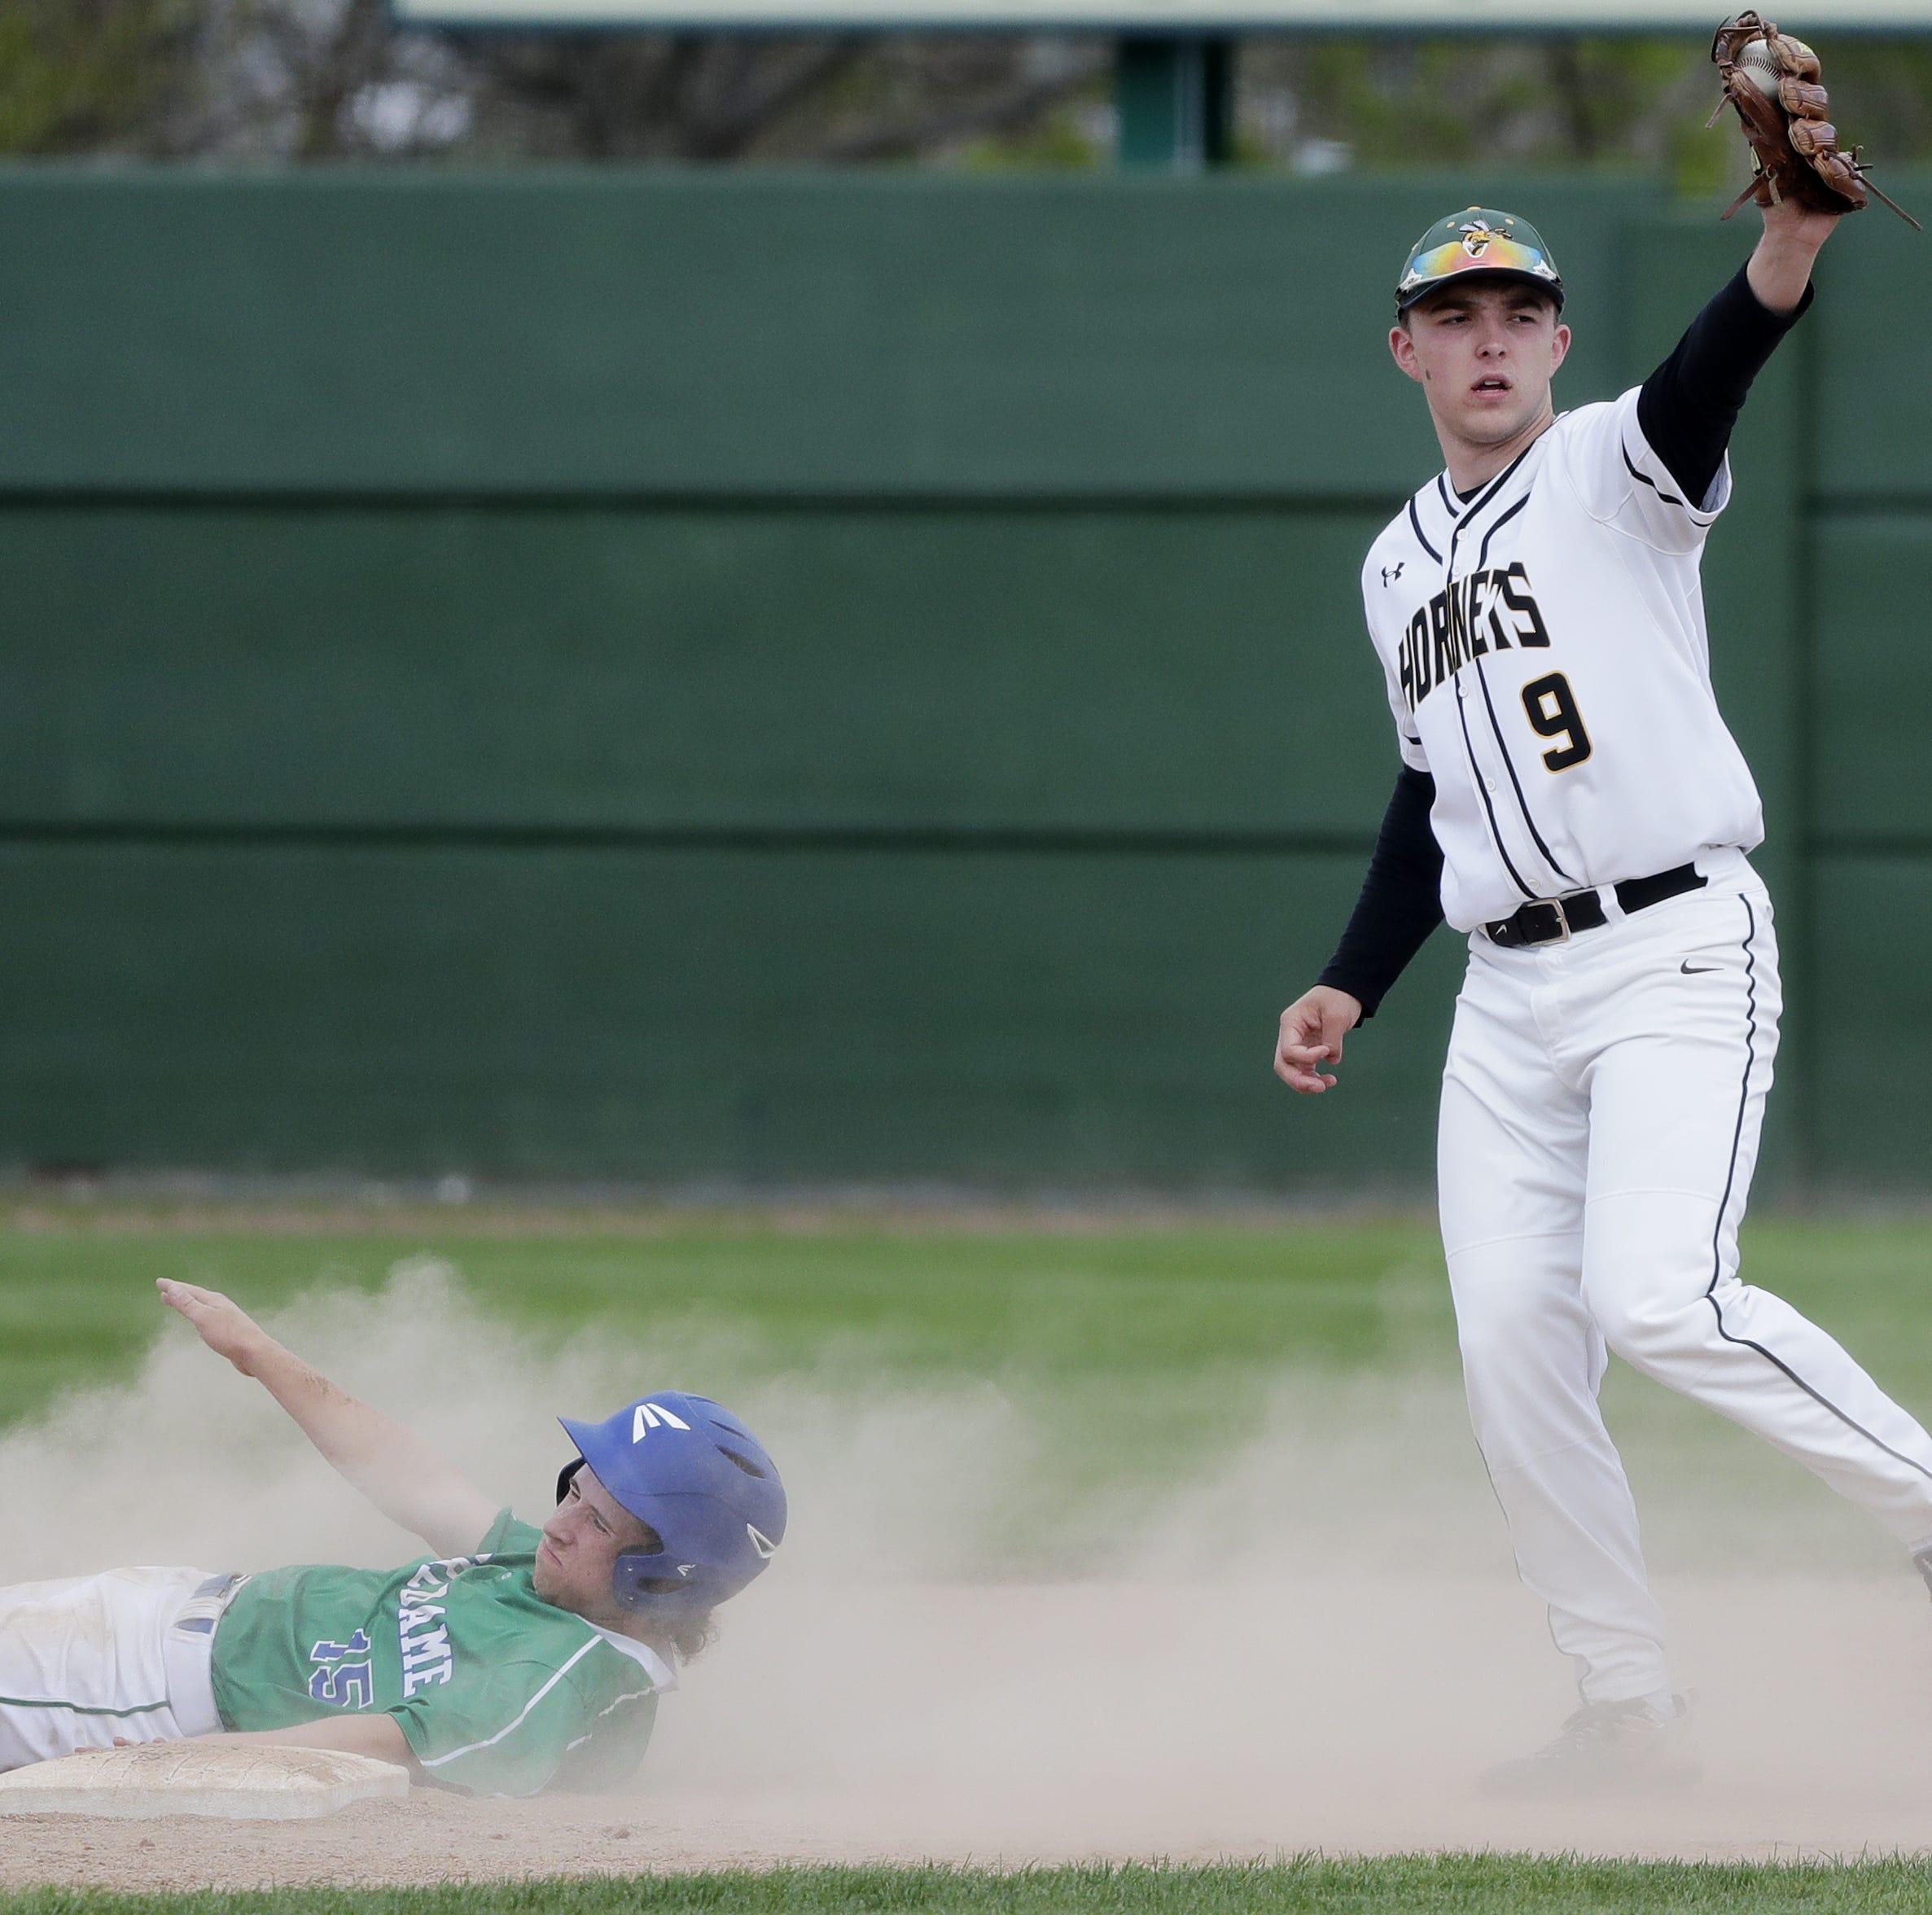 Green Bay Preble's star baseball recruits, best friends have big dreams